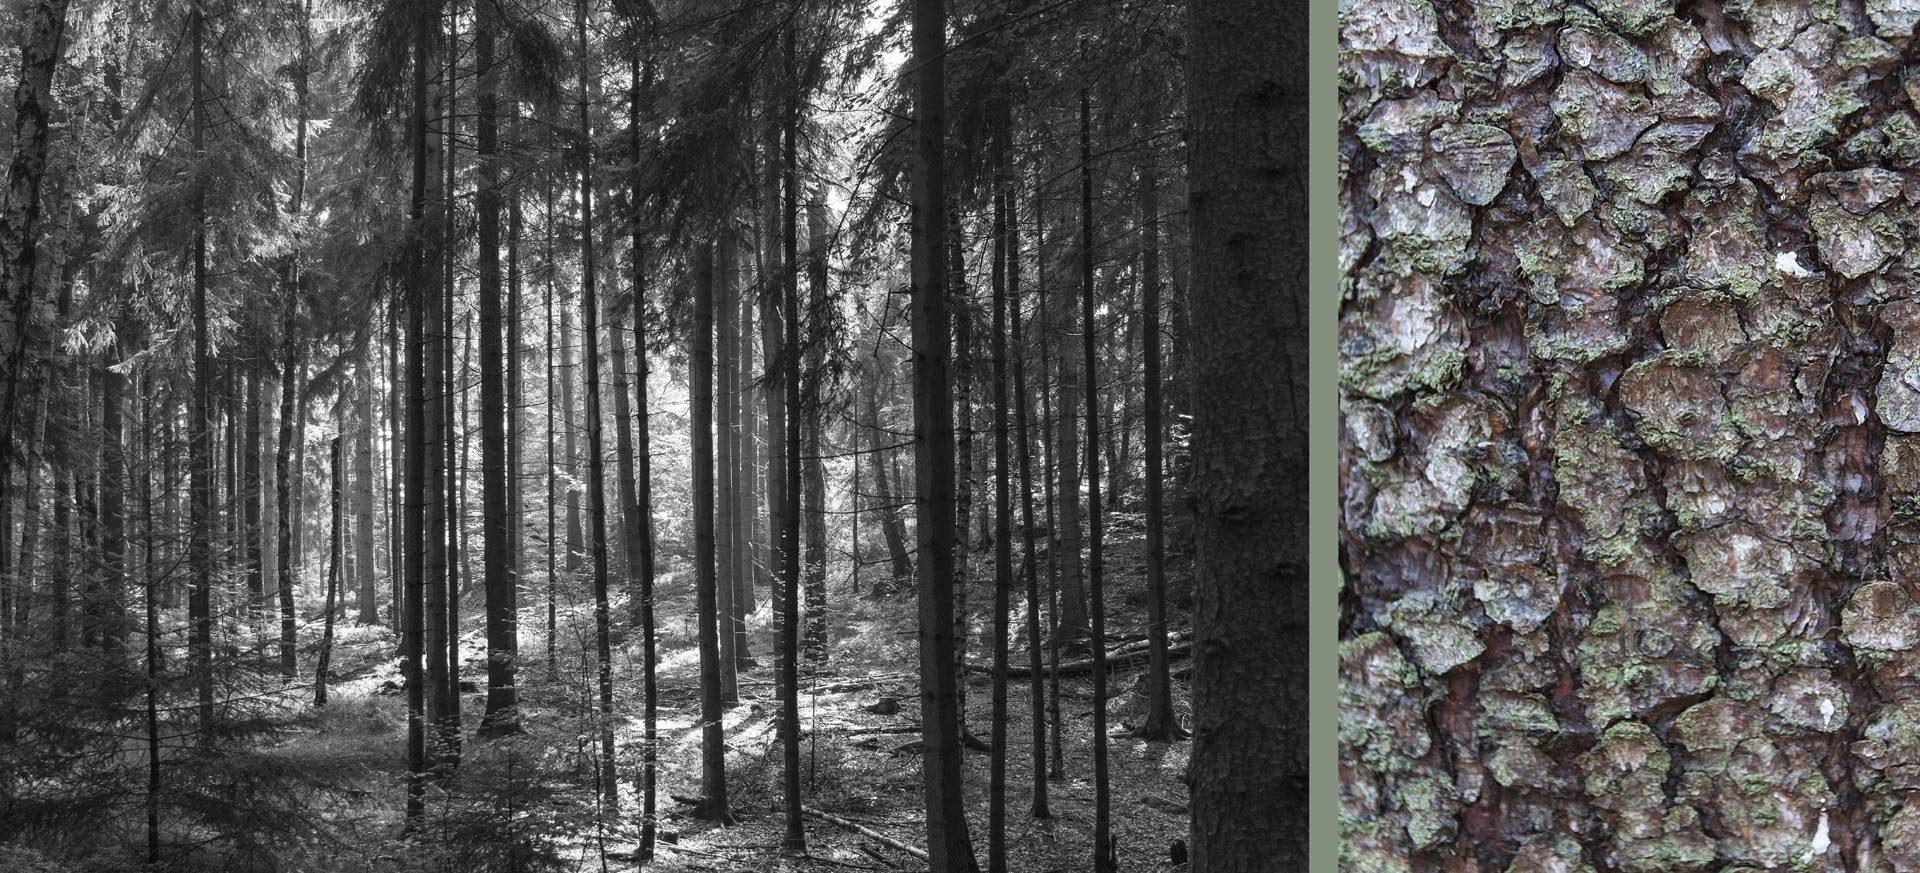 WaldRindenDoppel Tannen IV • Lambda-Print auf KODAK Pro Endura, Alu-Dibond®, 110 x 50 cm, gerahmt als Art-Box • Auflage: 5 + 2 Artist's Proof